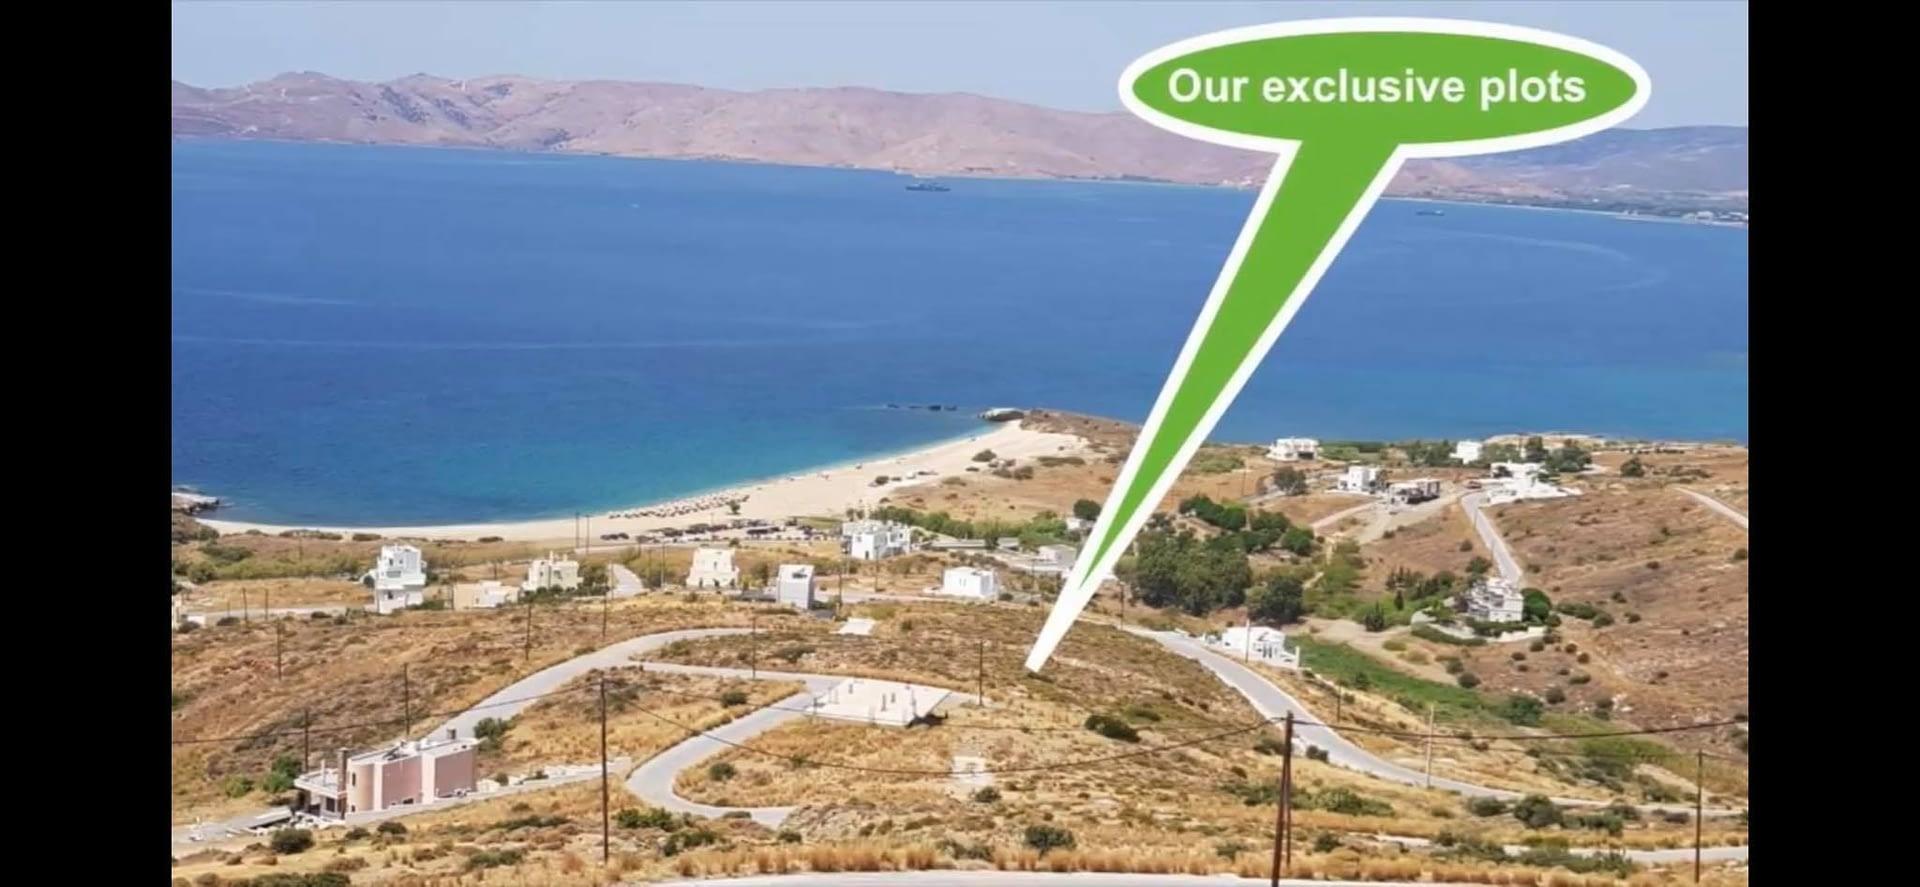 KARYSTOS GREECE PLOTS